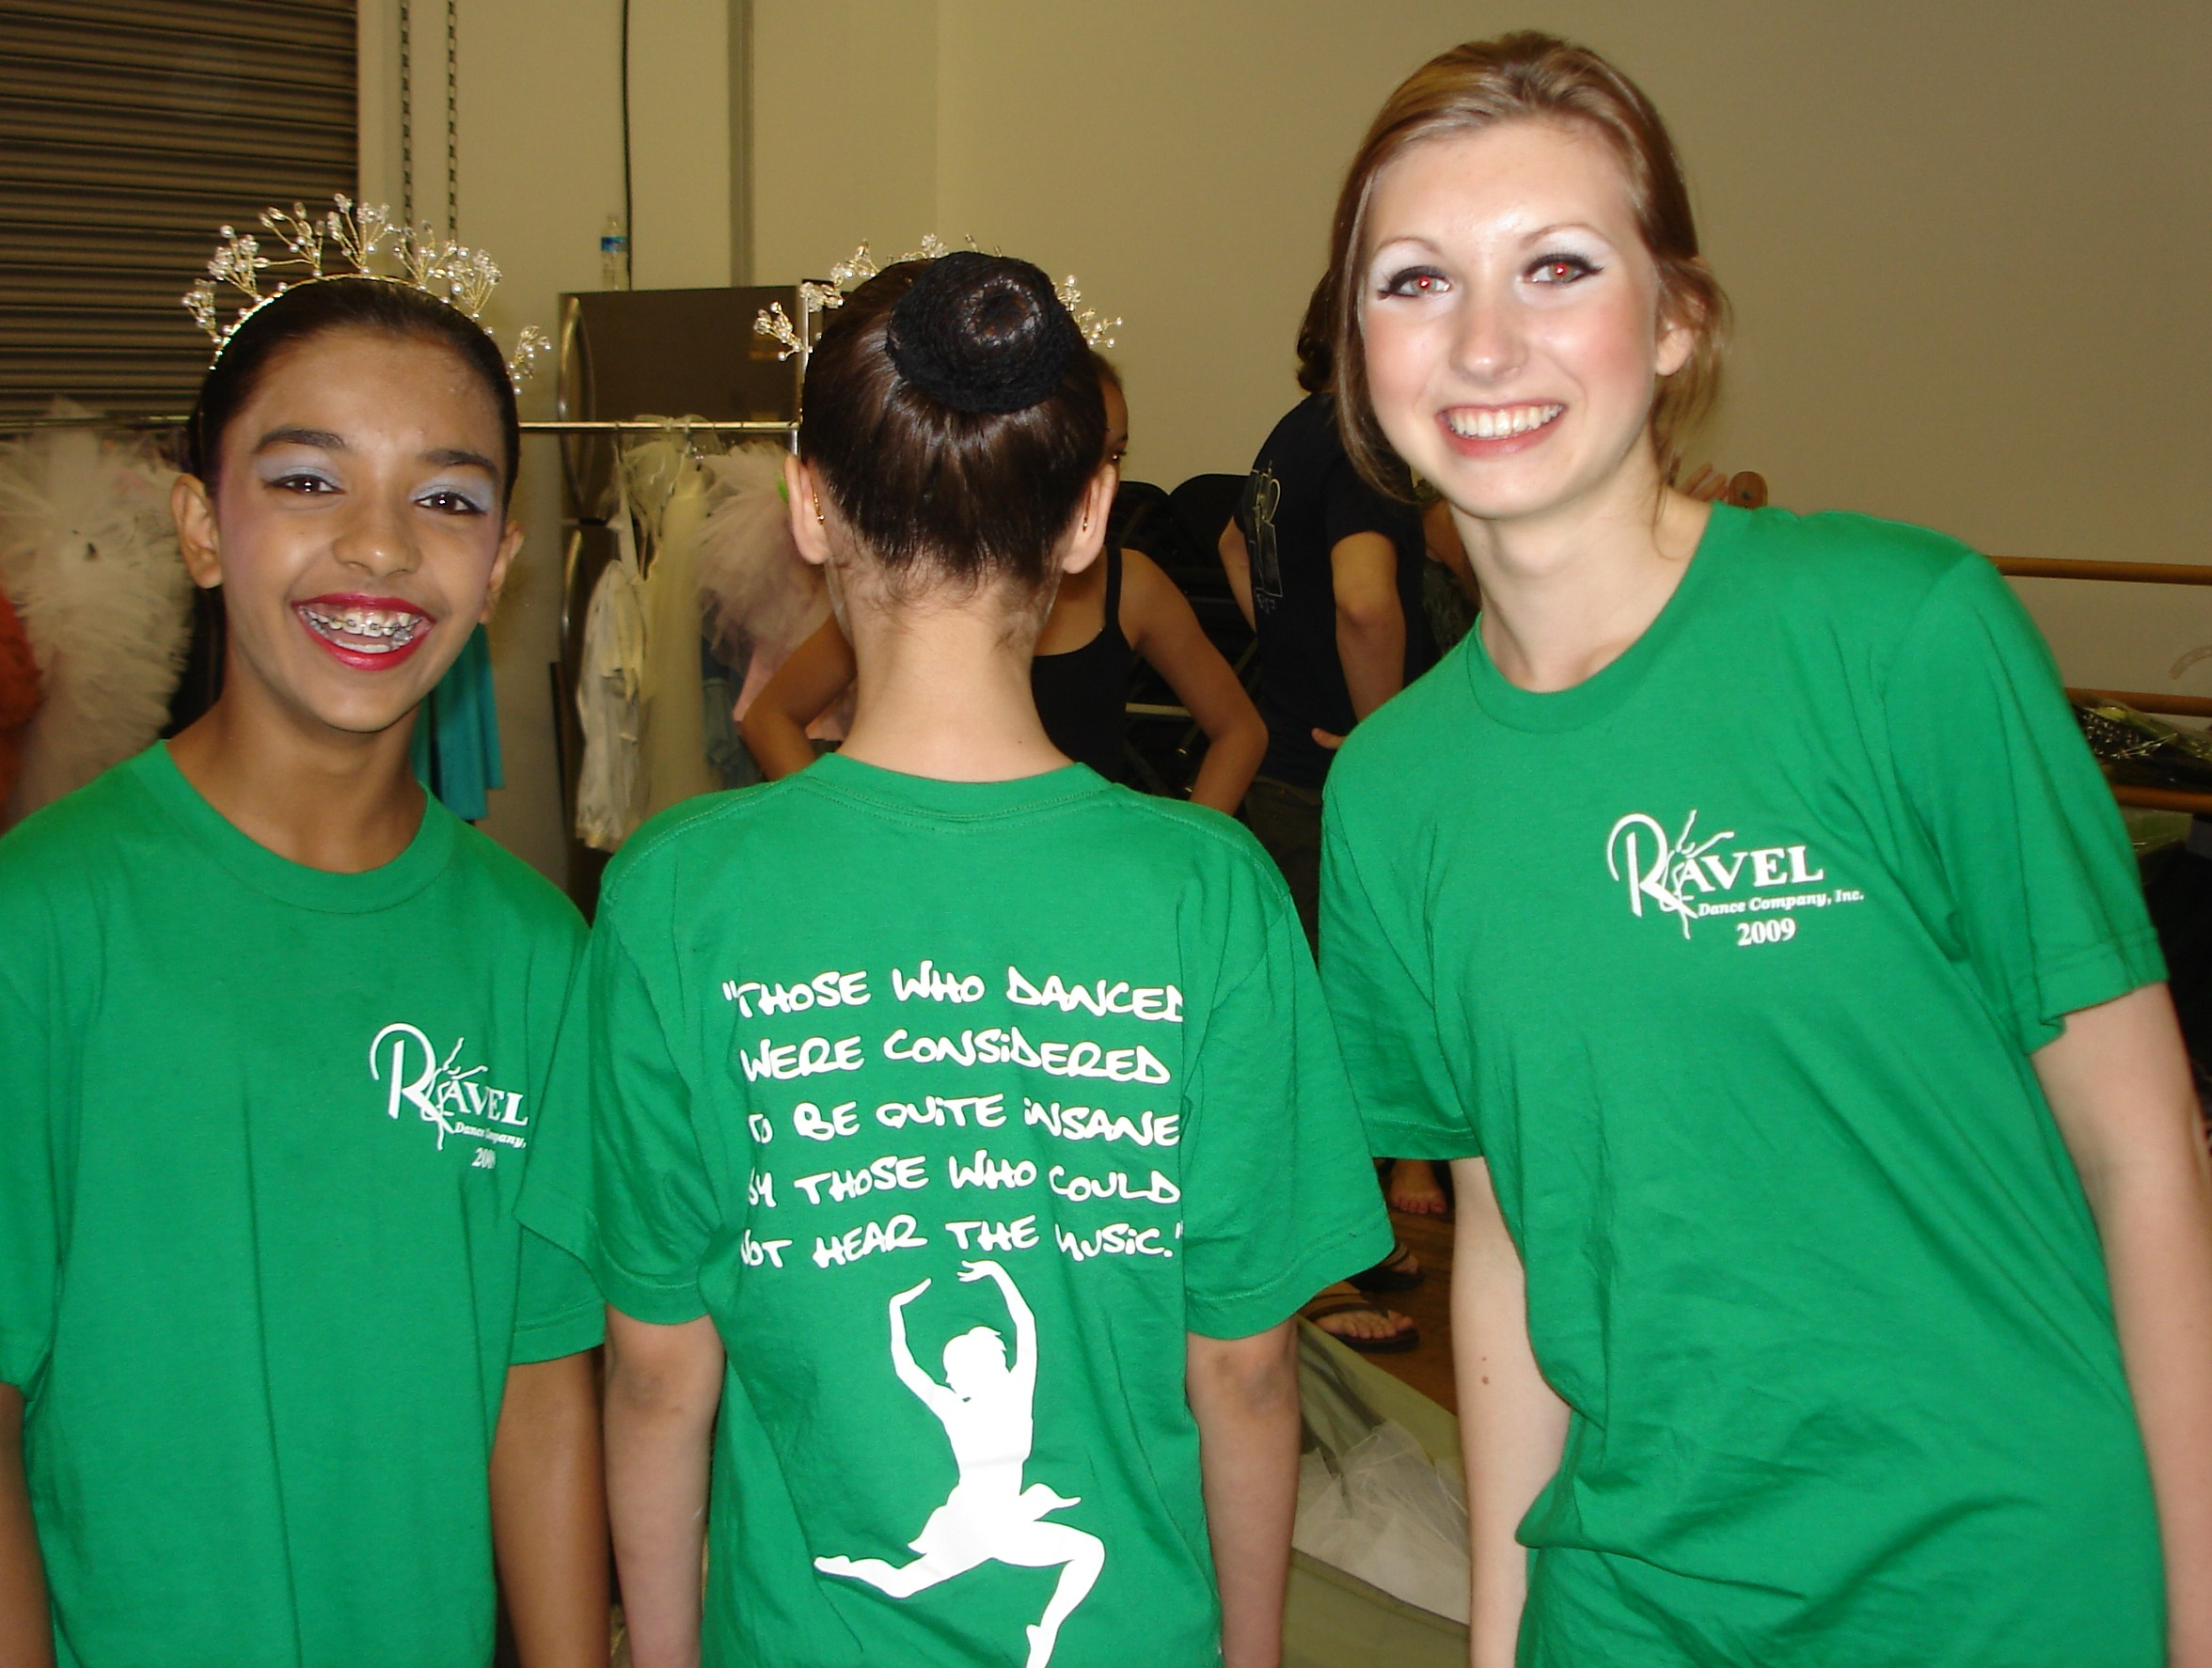 ravel dance company 2009 t shirt photo